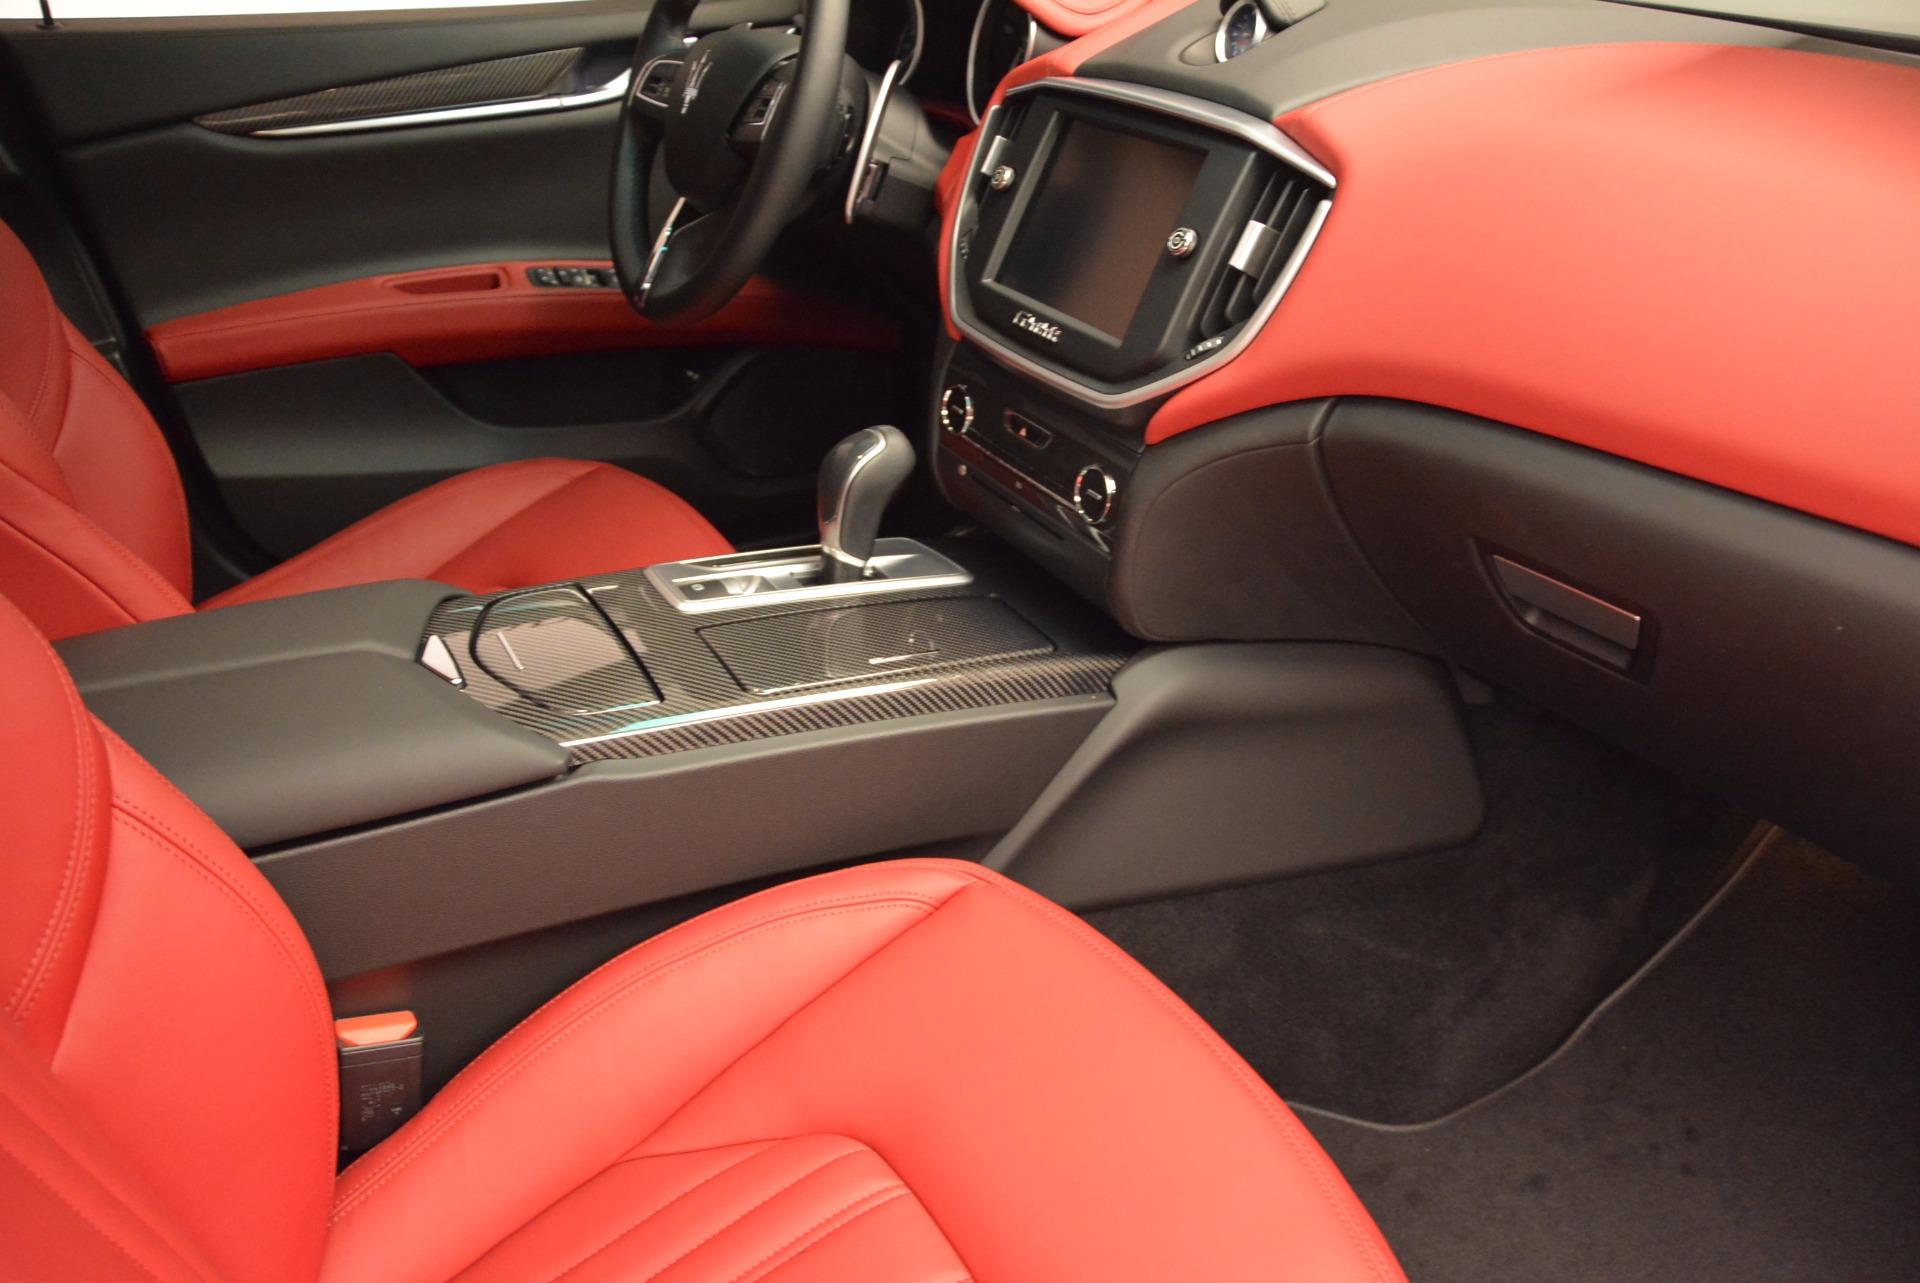 Used 2015 Maserati Ghibli S Q4 For Sale In Greenwich, CT 1290_p20